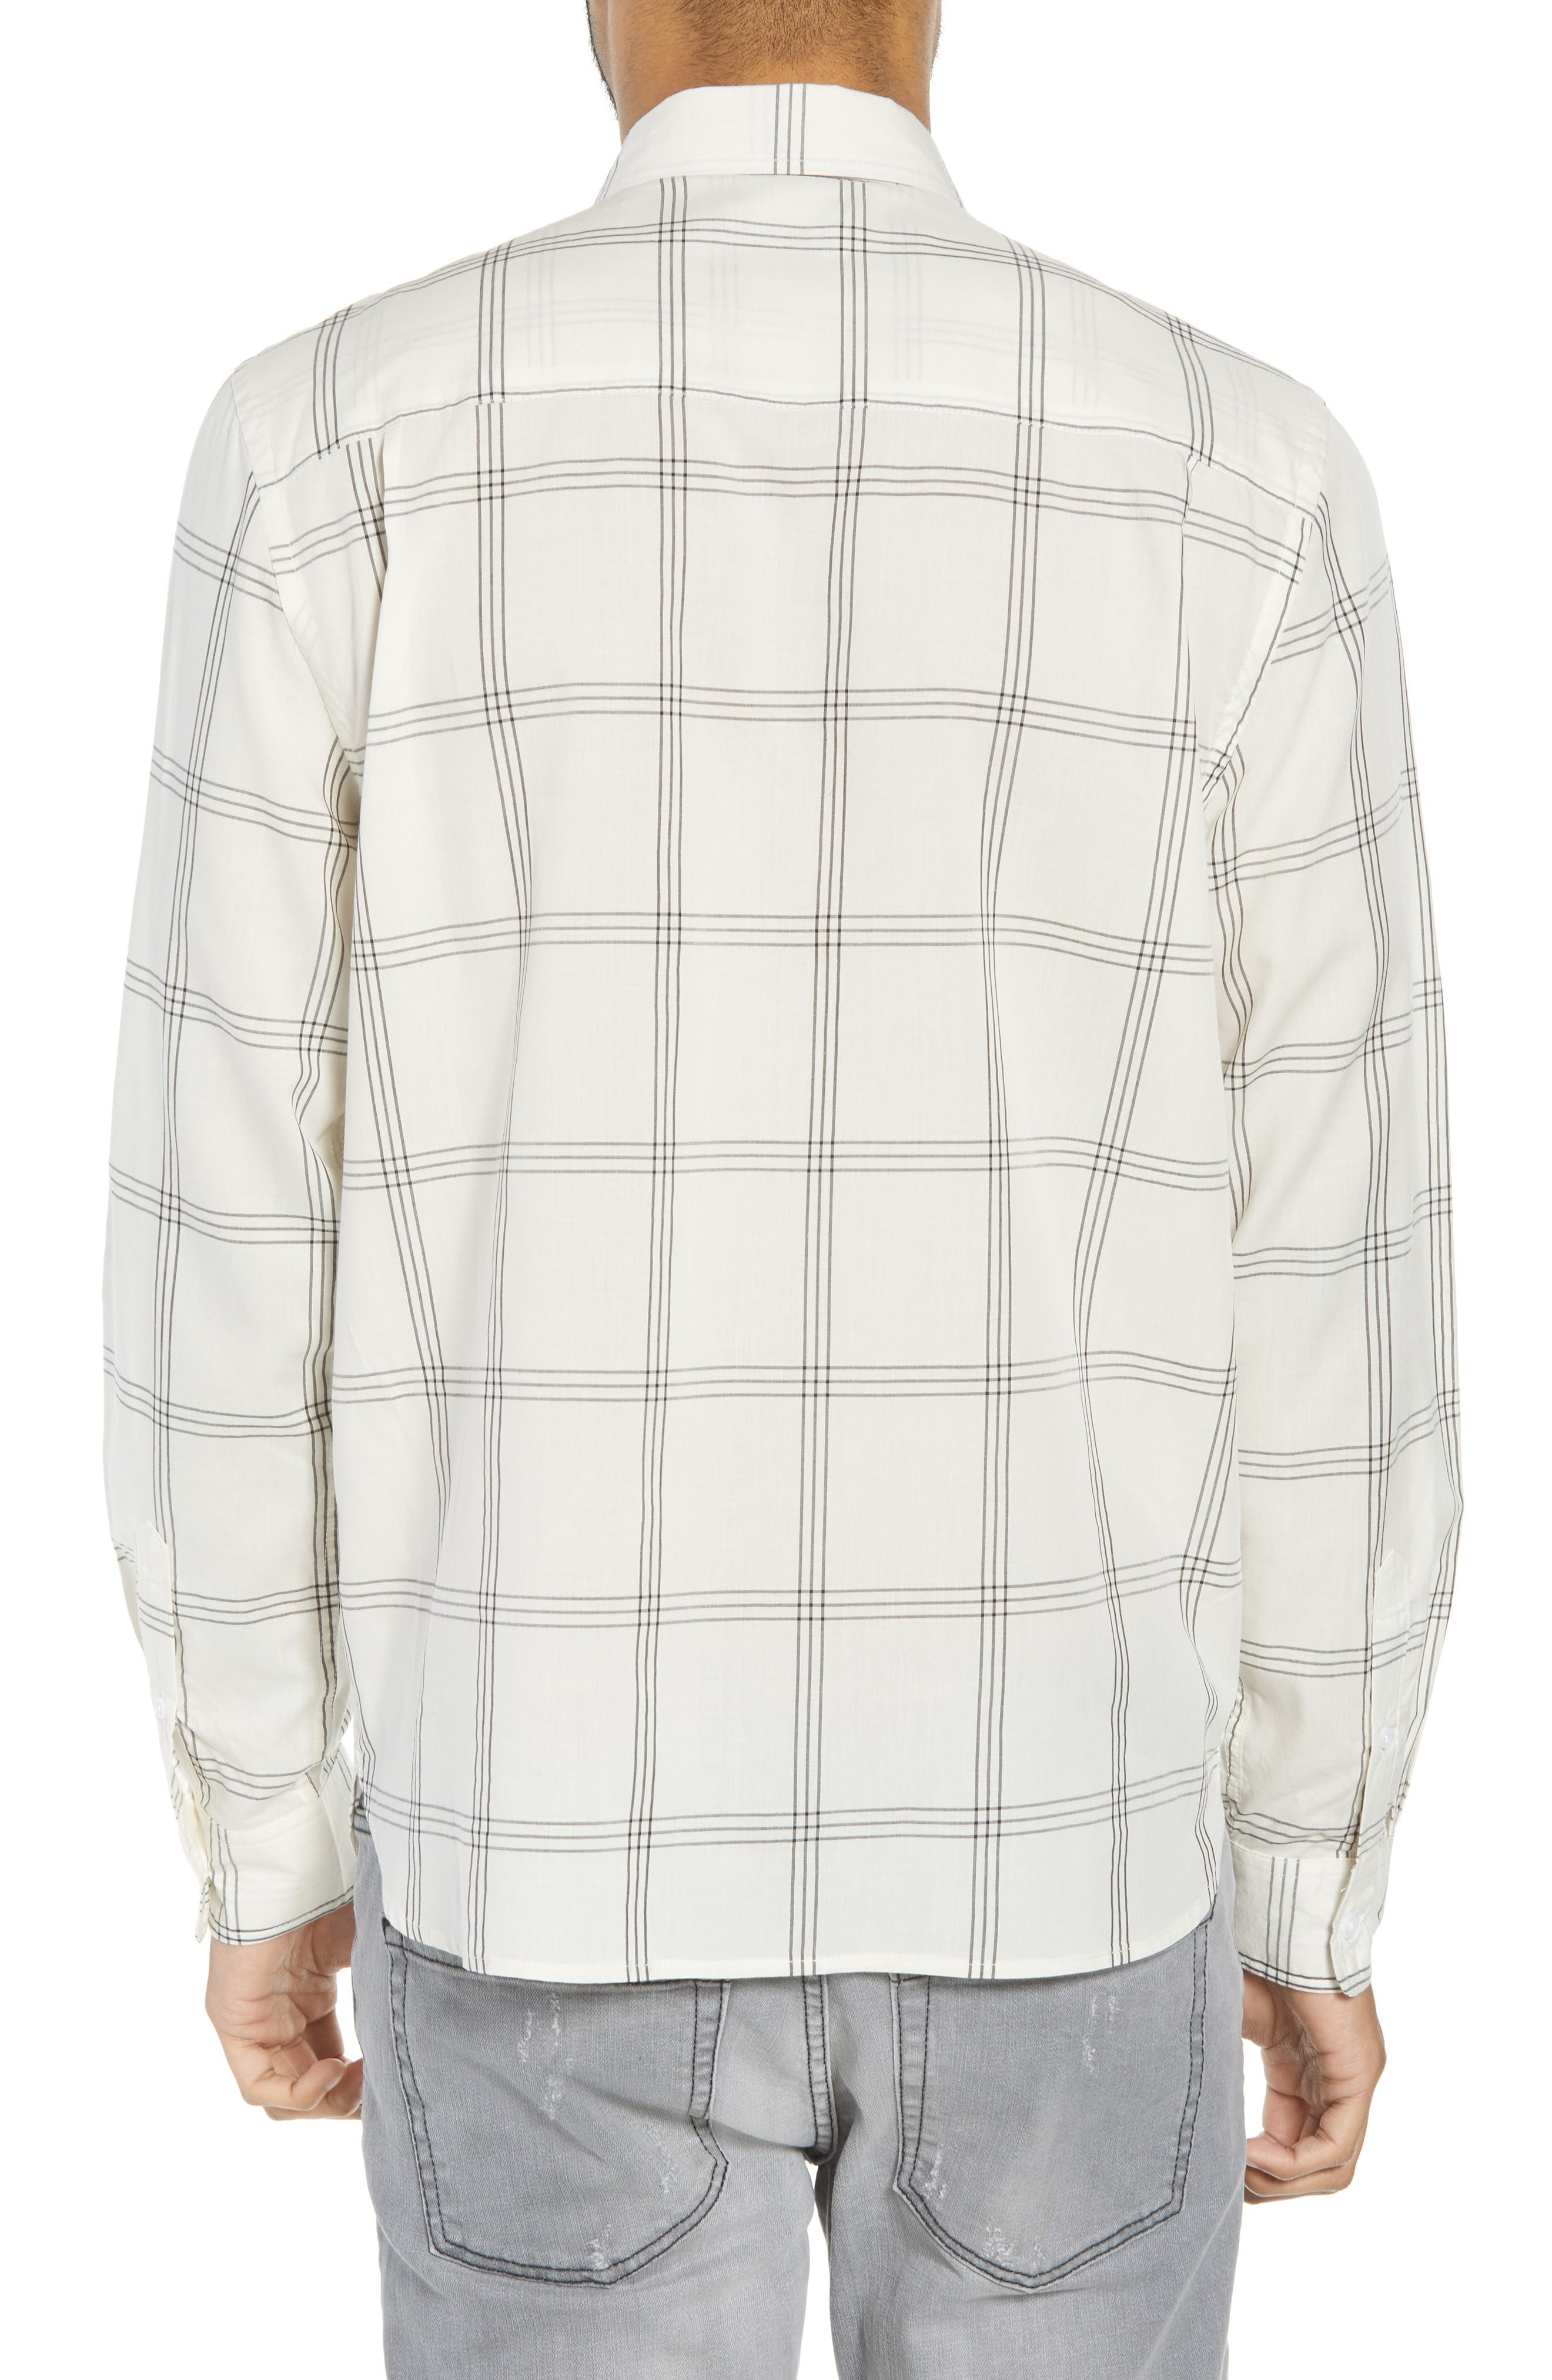 Mickey Windowpane Woven Shirt,                             Alternate thumbnail 3, color,                             White